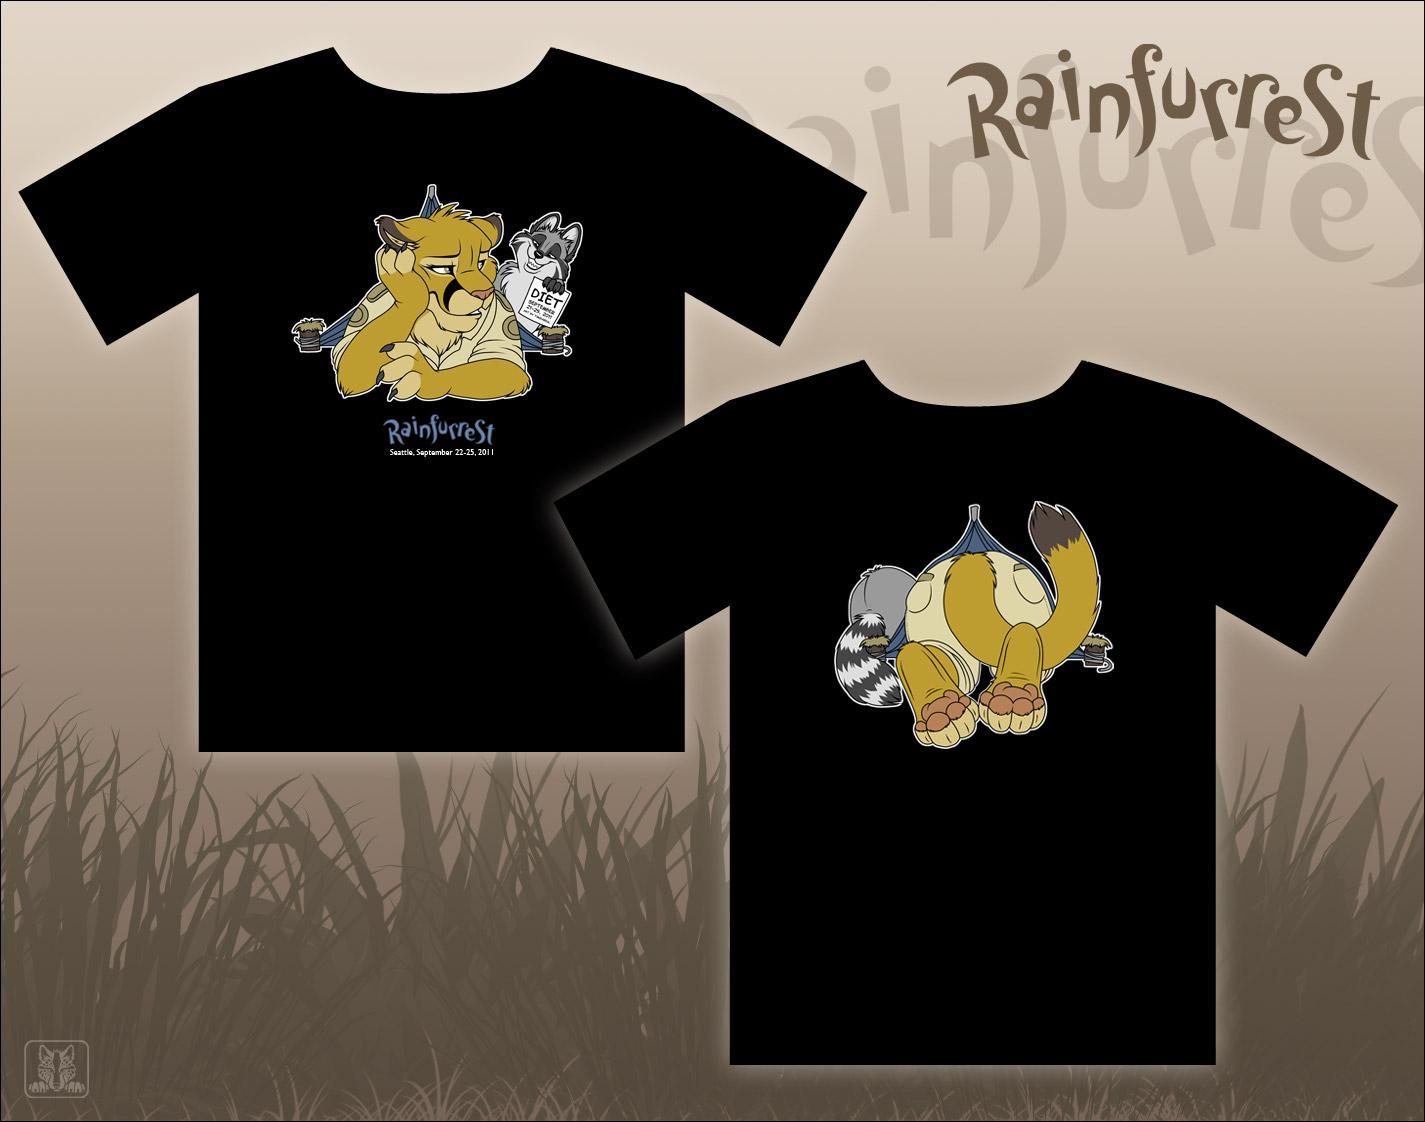 Rainfurrest 2011 T-Shirt by TaniDaReal